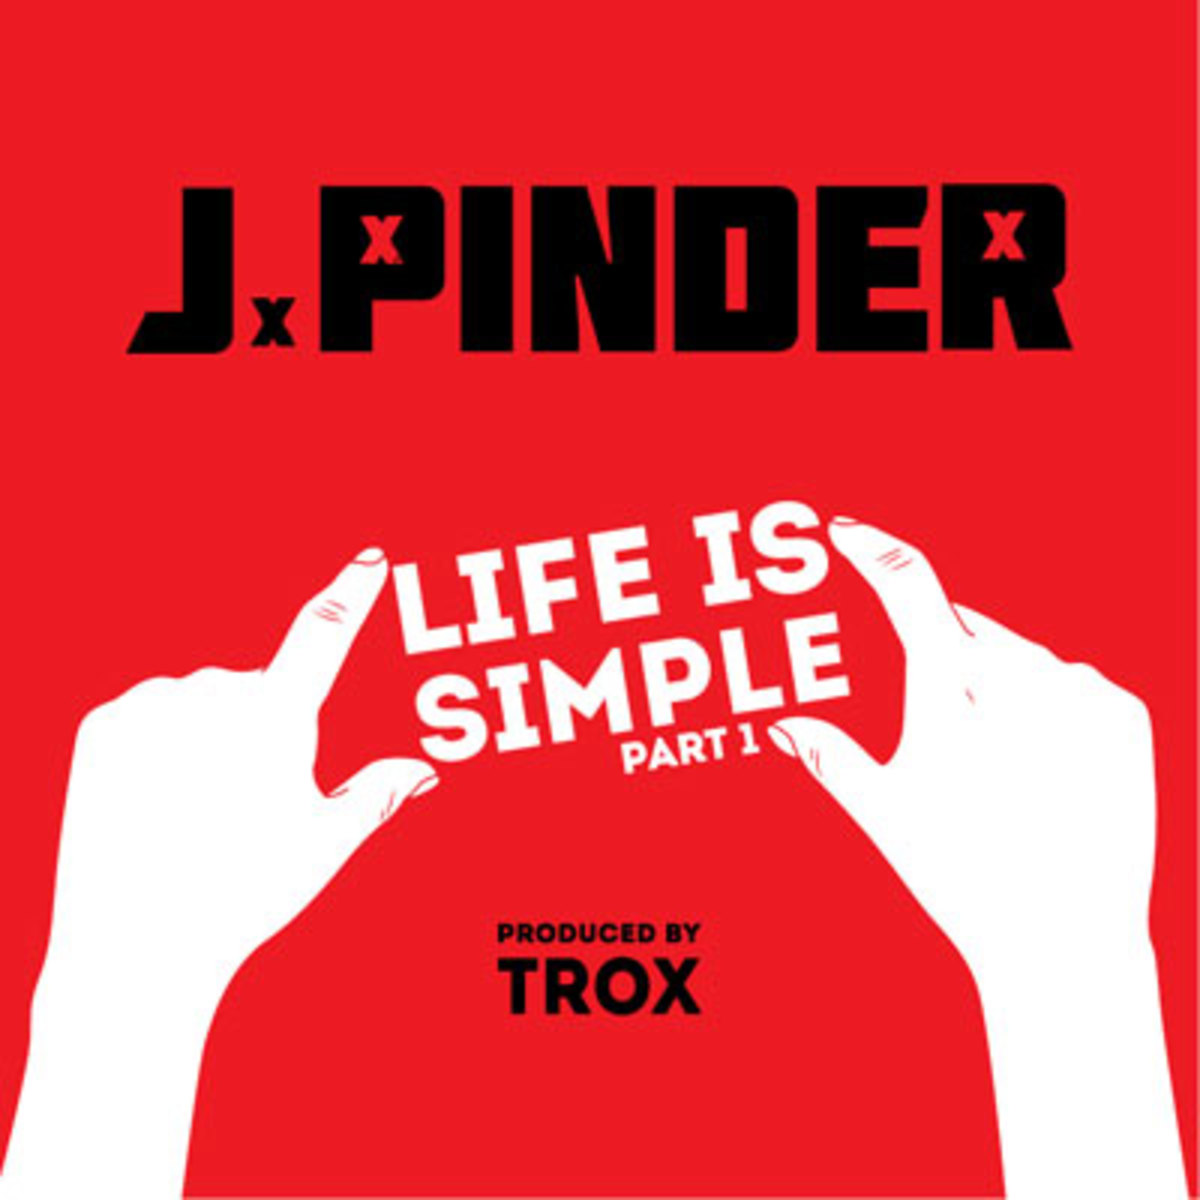 jpinder-lifesimplept1.jpg